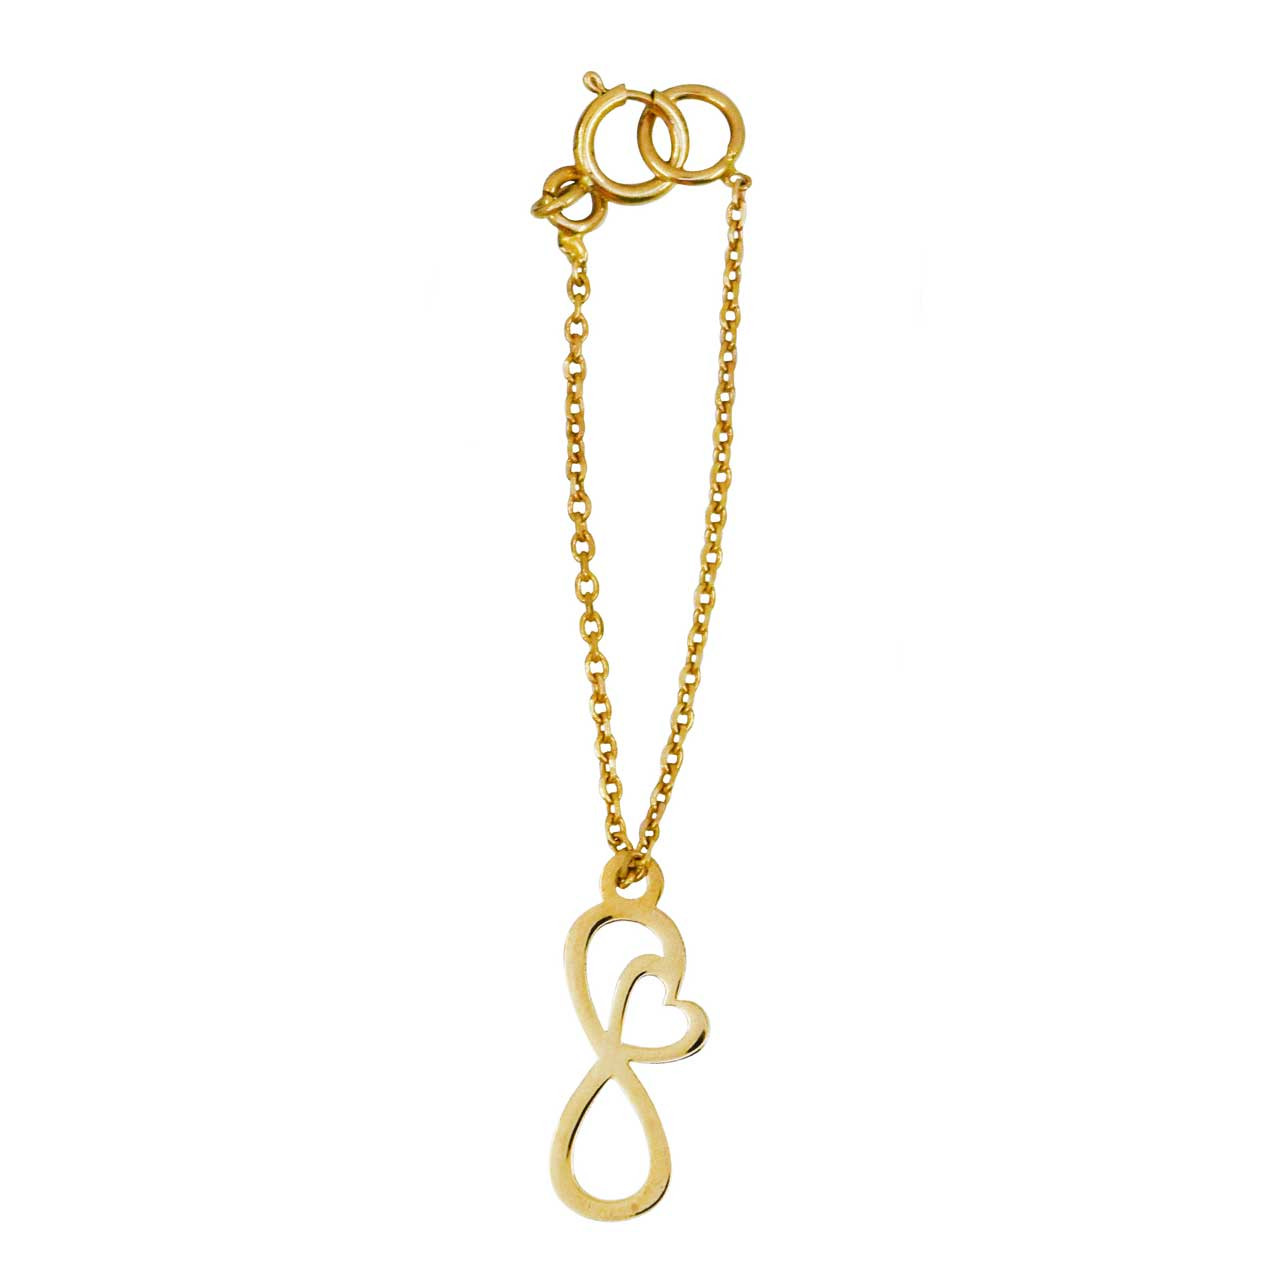 آویز ساعت طلا 18 عیار زنانه کانیار گالری مدل AS191